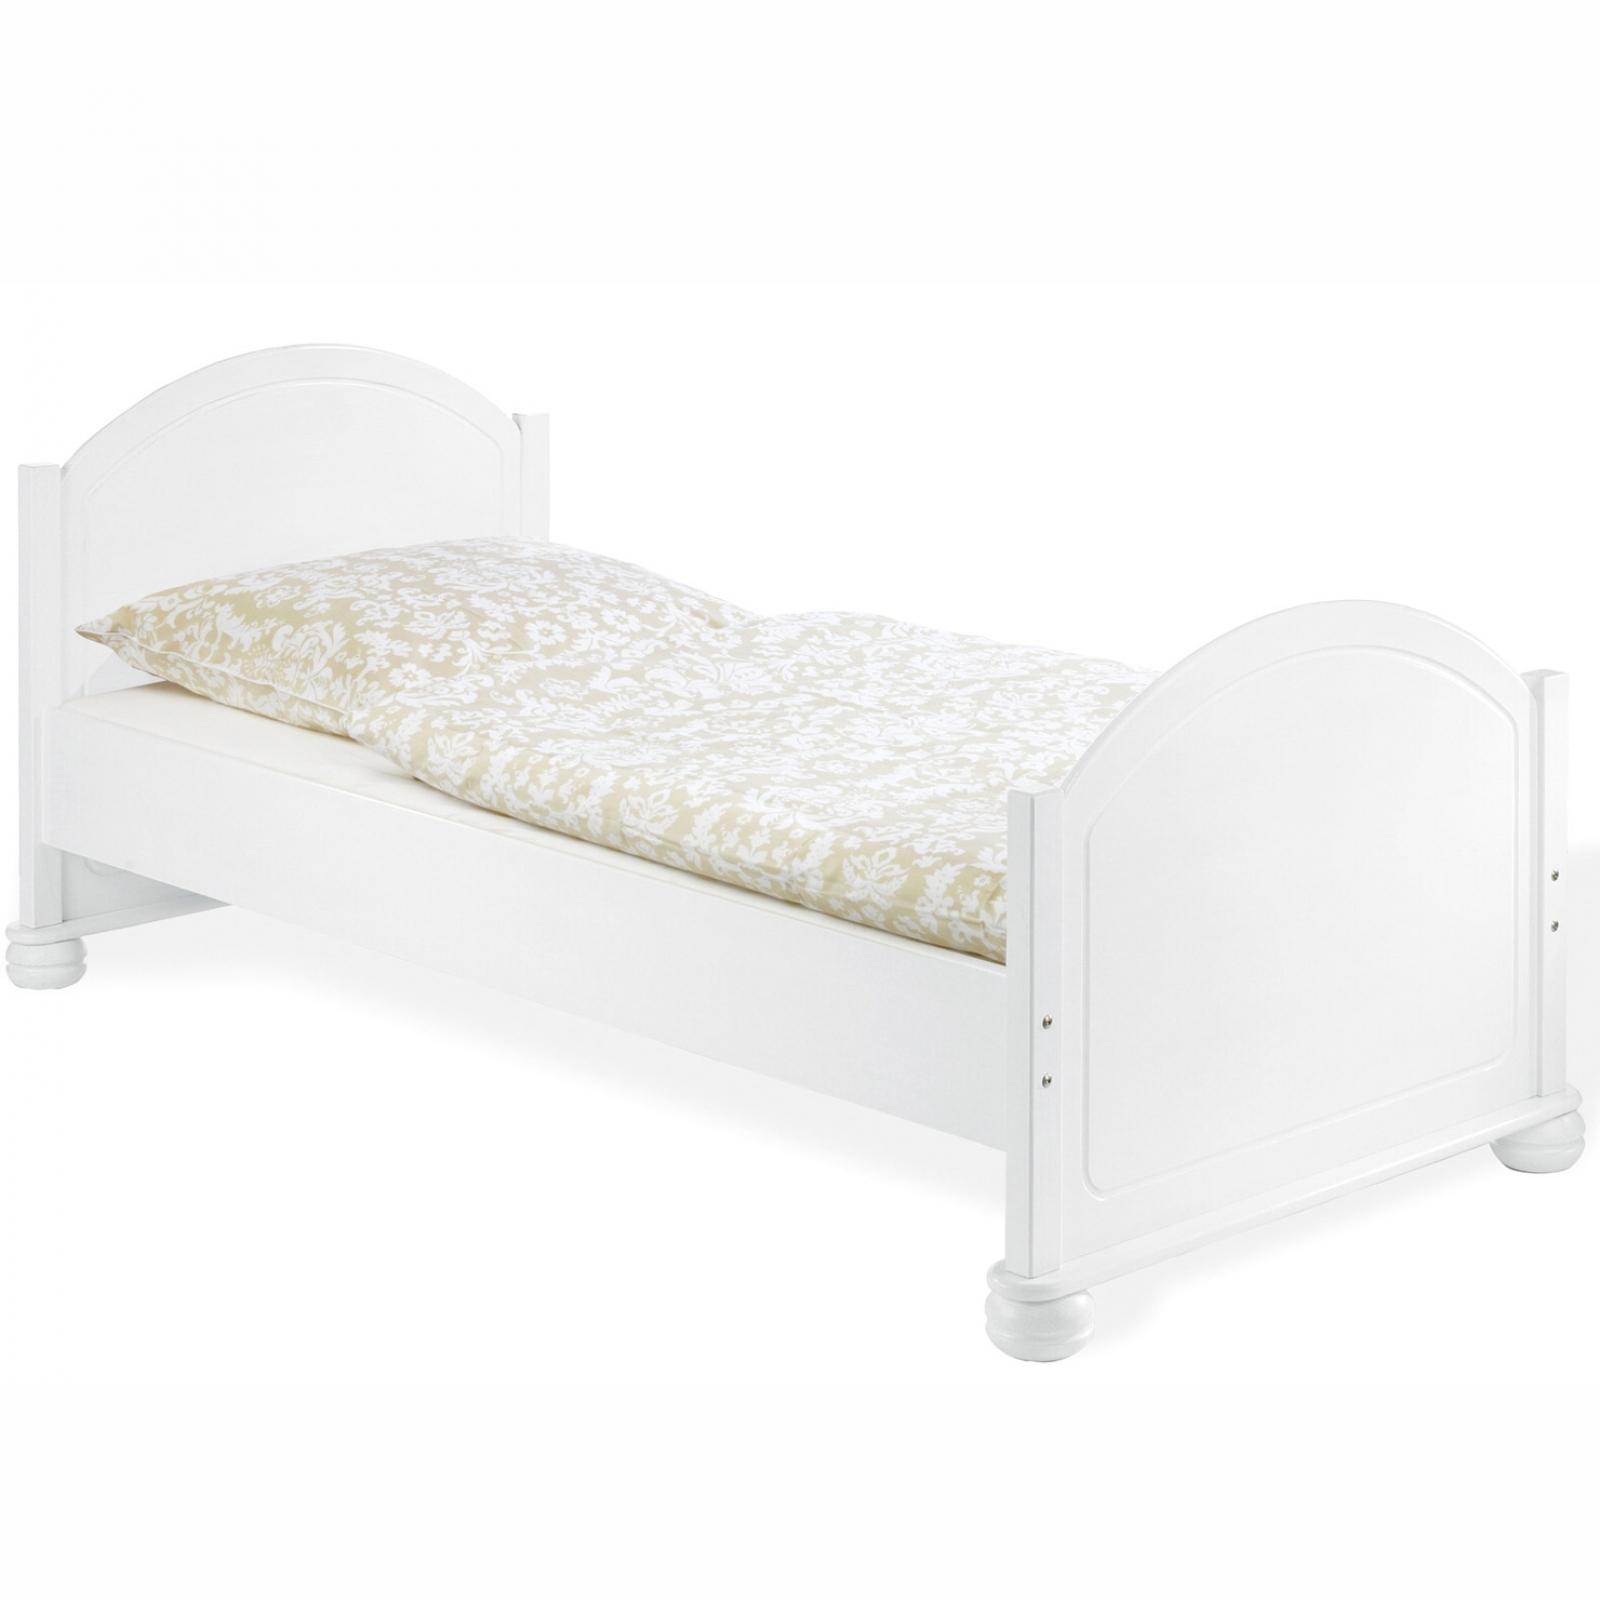 lit bois massif lasur blanc clara. Black Bedroom Furniture Sets. Home Design Ideas